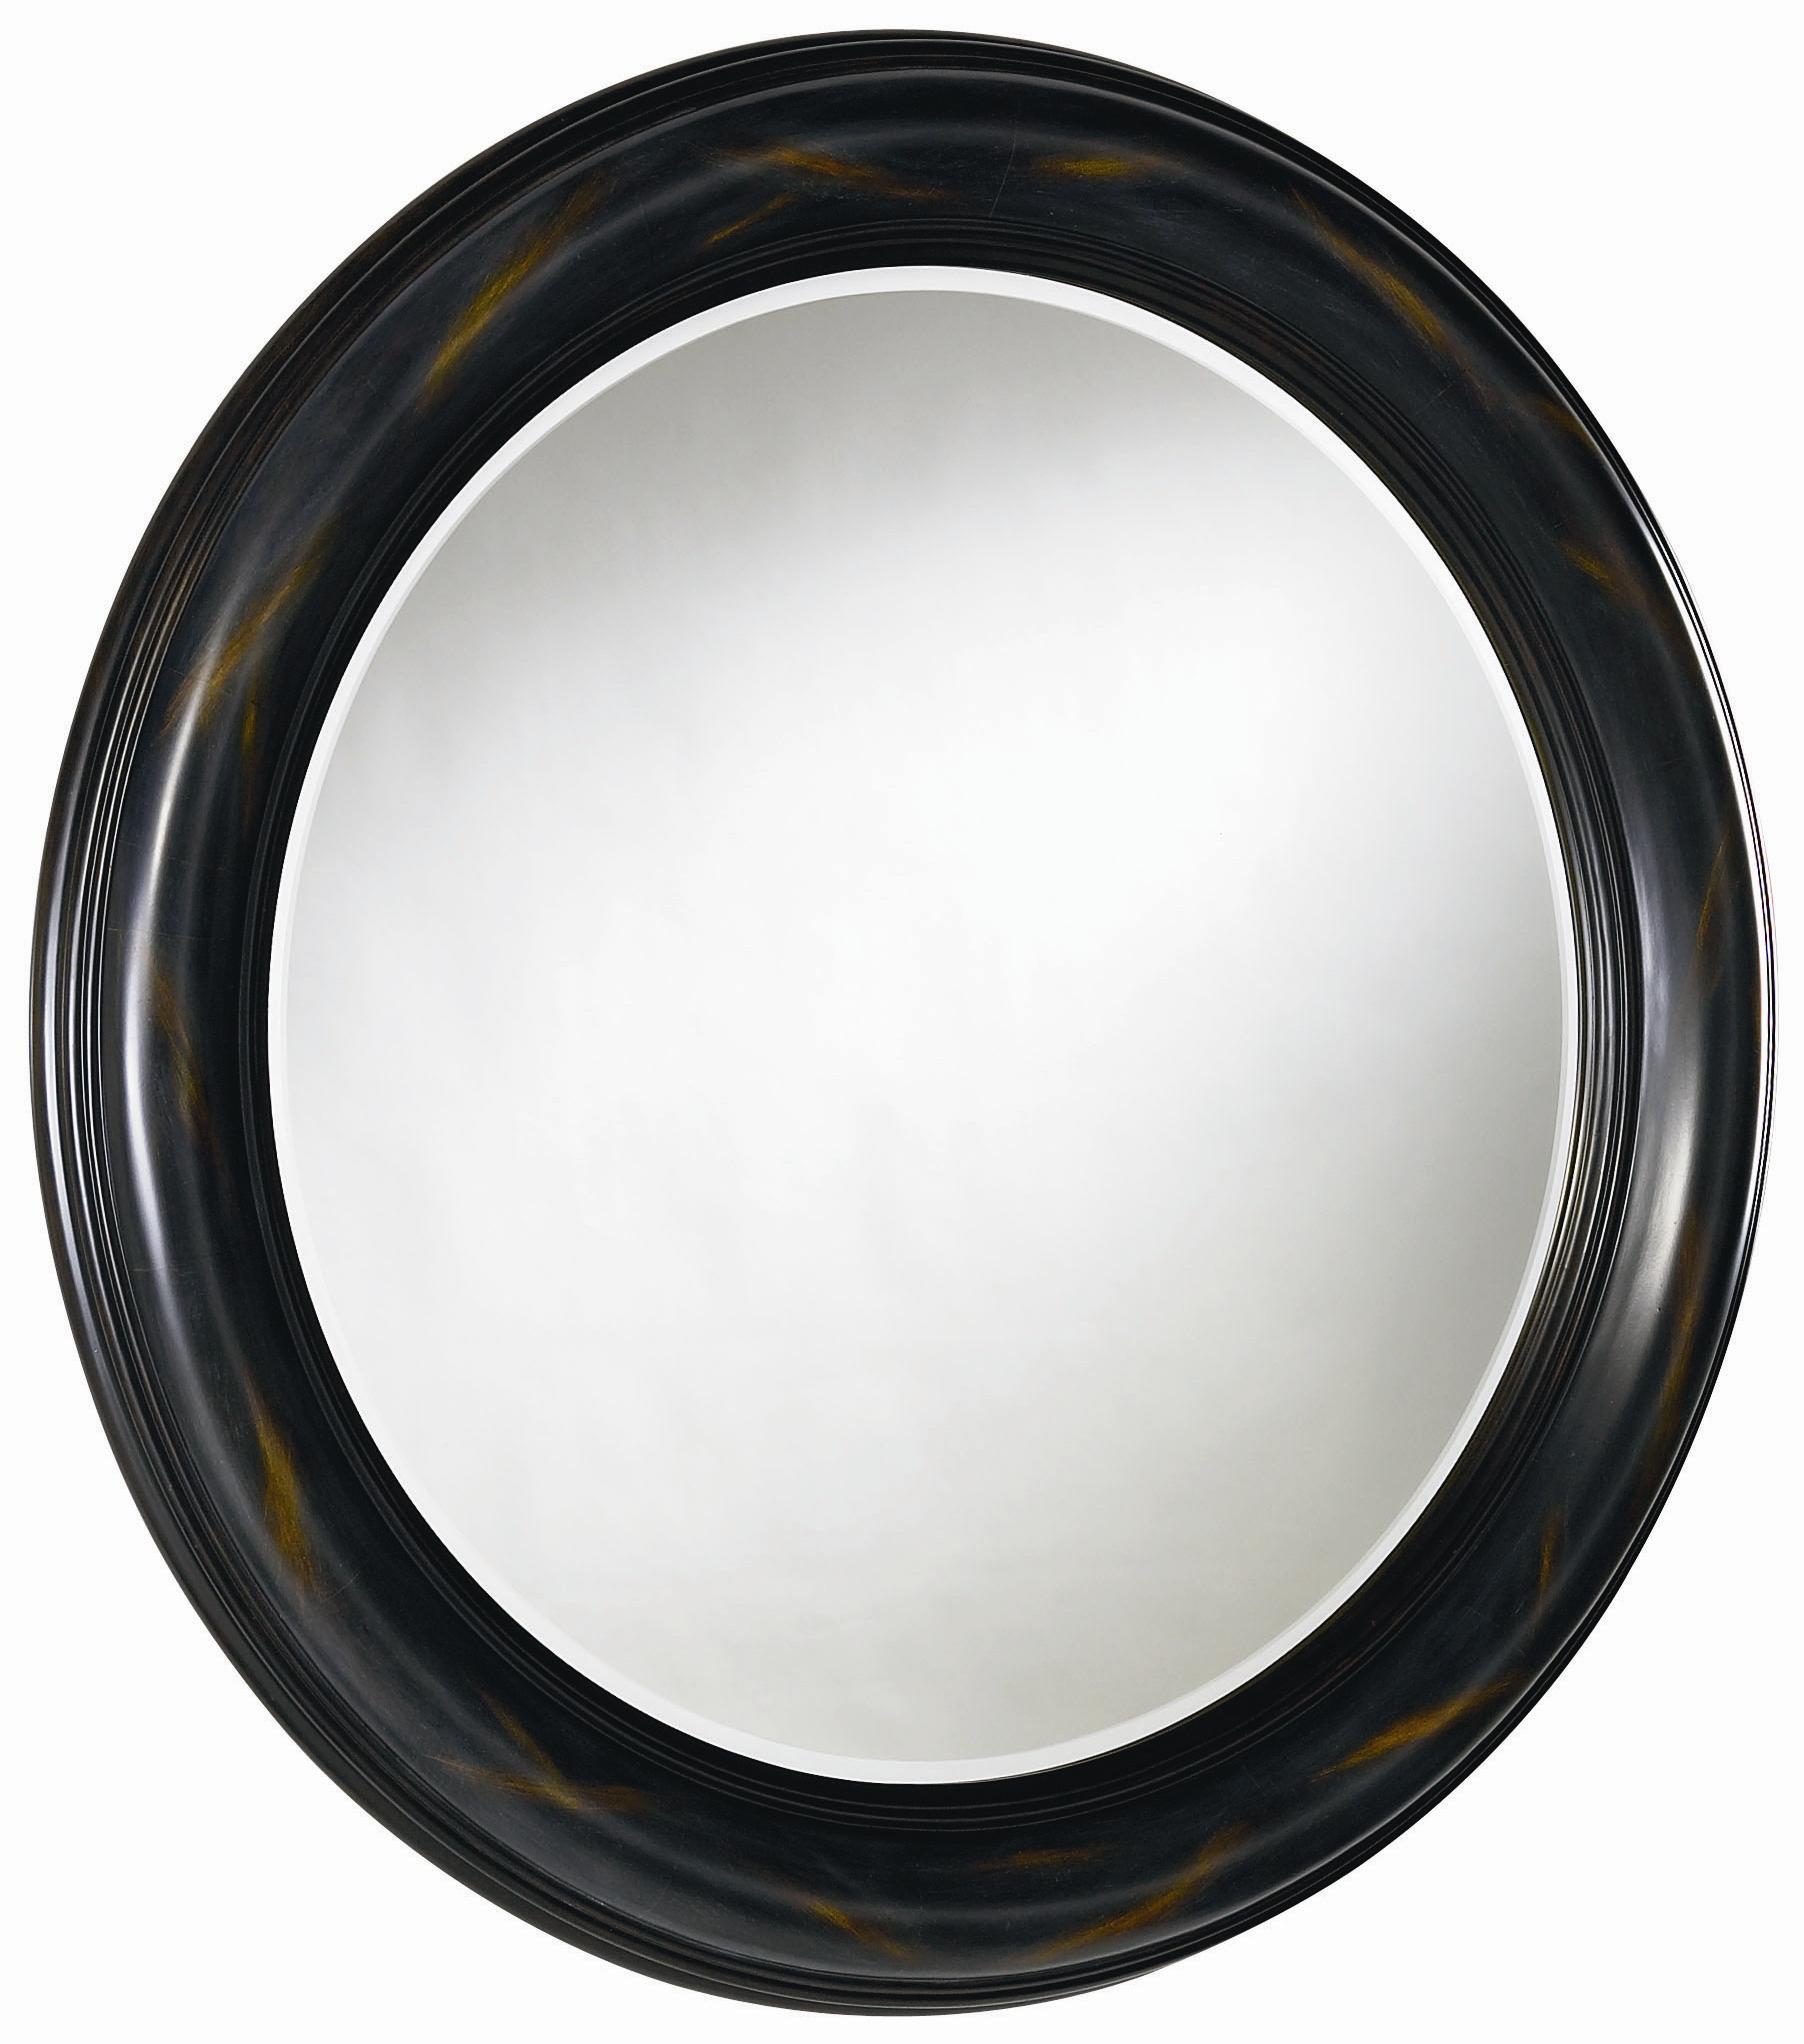 Thomasville® Ernest Hemingway  Romero Round Mirror - Item Number: 46291-255